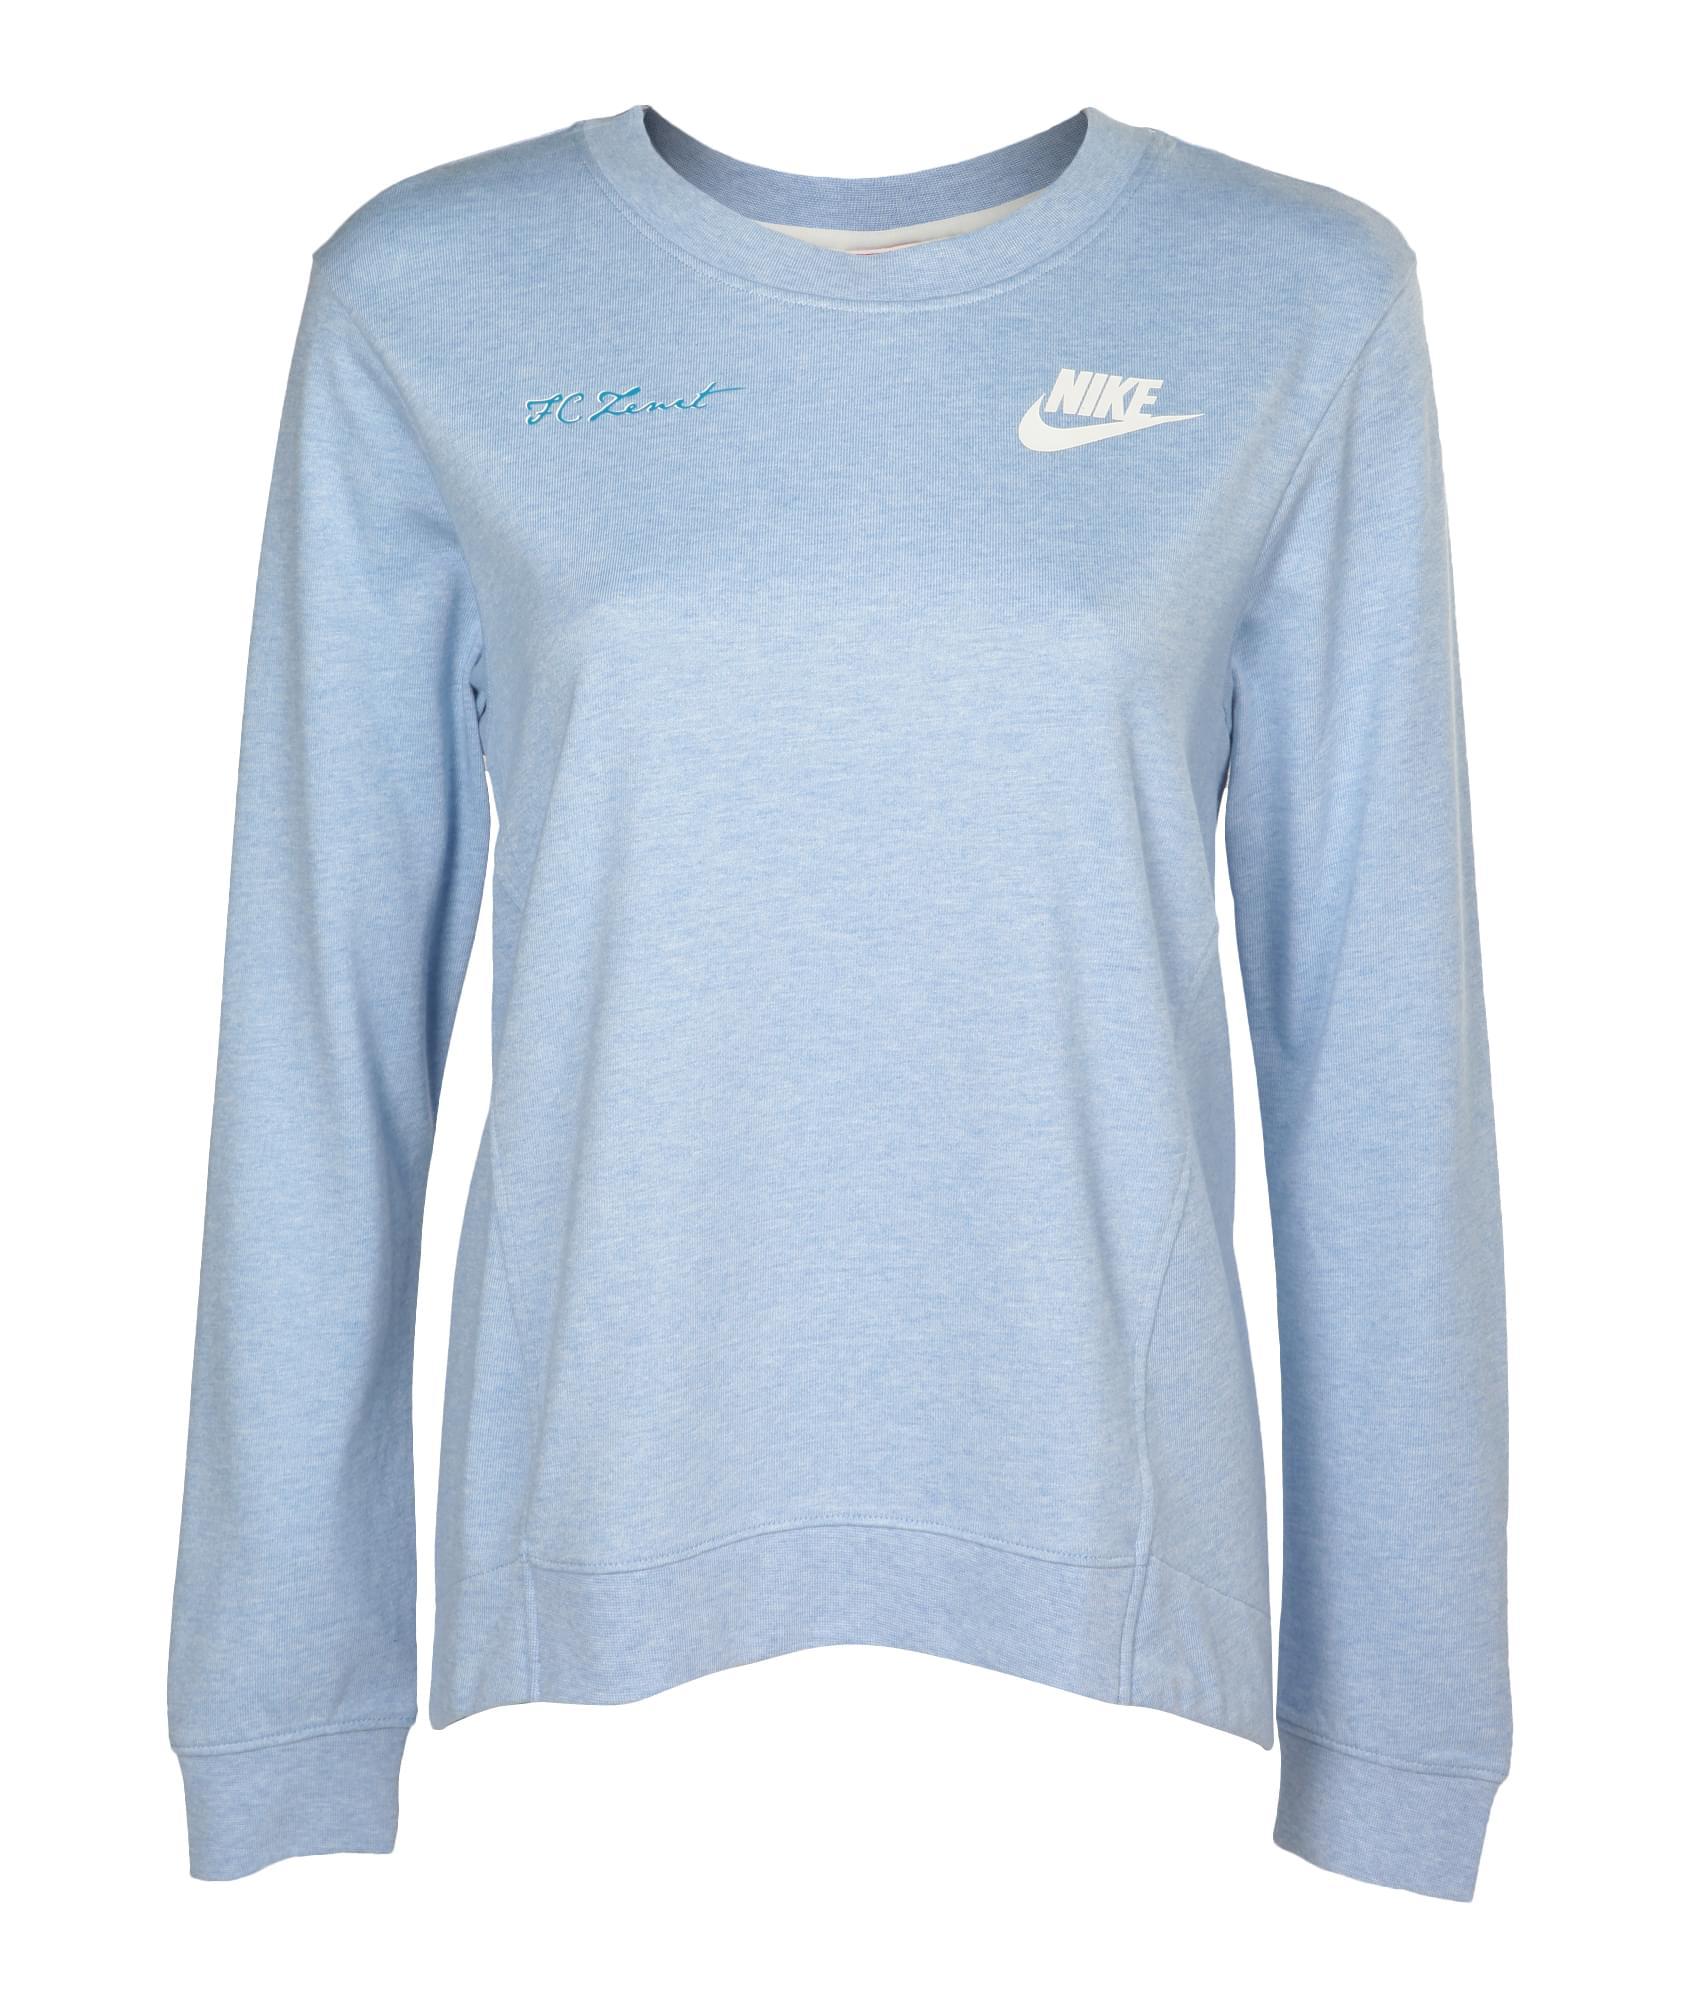 Джемпер женский Nike, Цвет-Голубой, Размер-L поло nike цвет голубой размер m